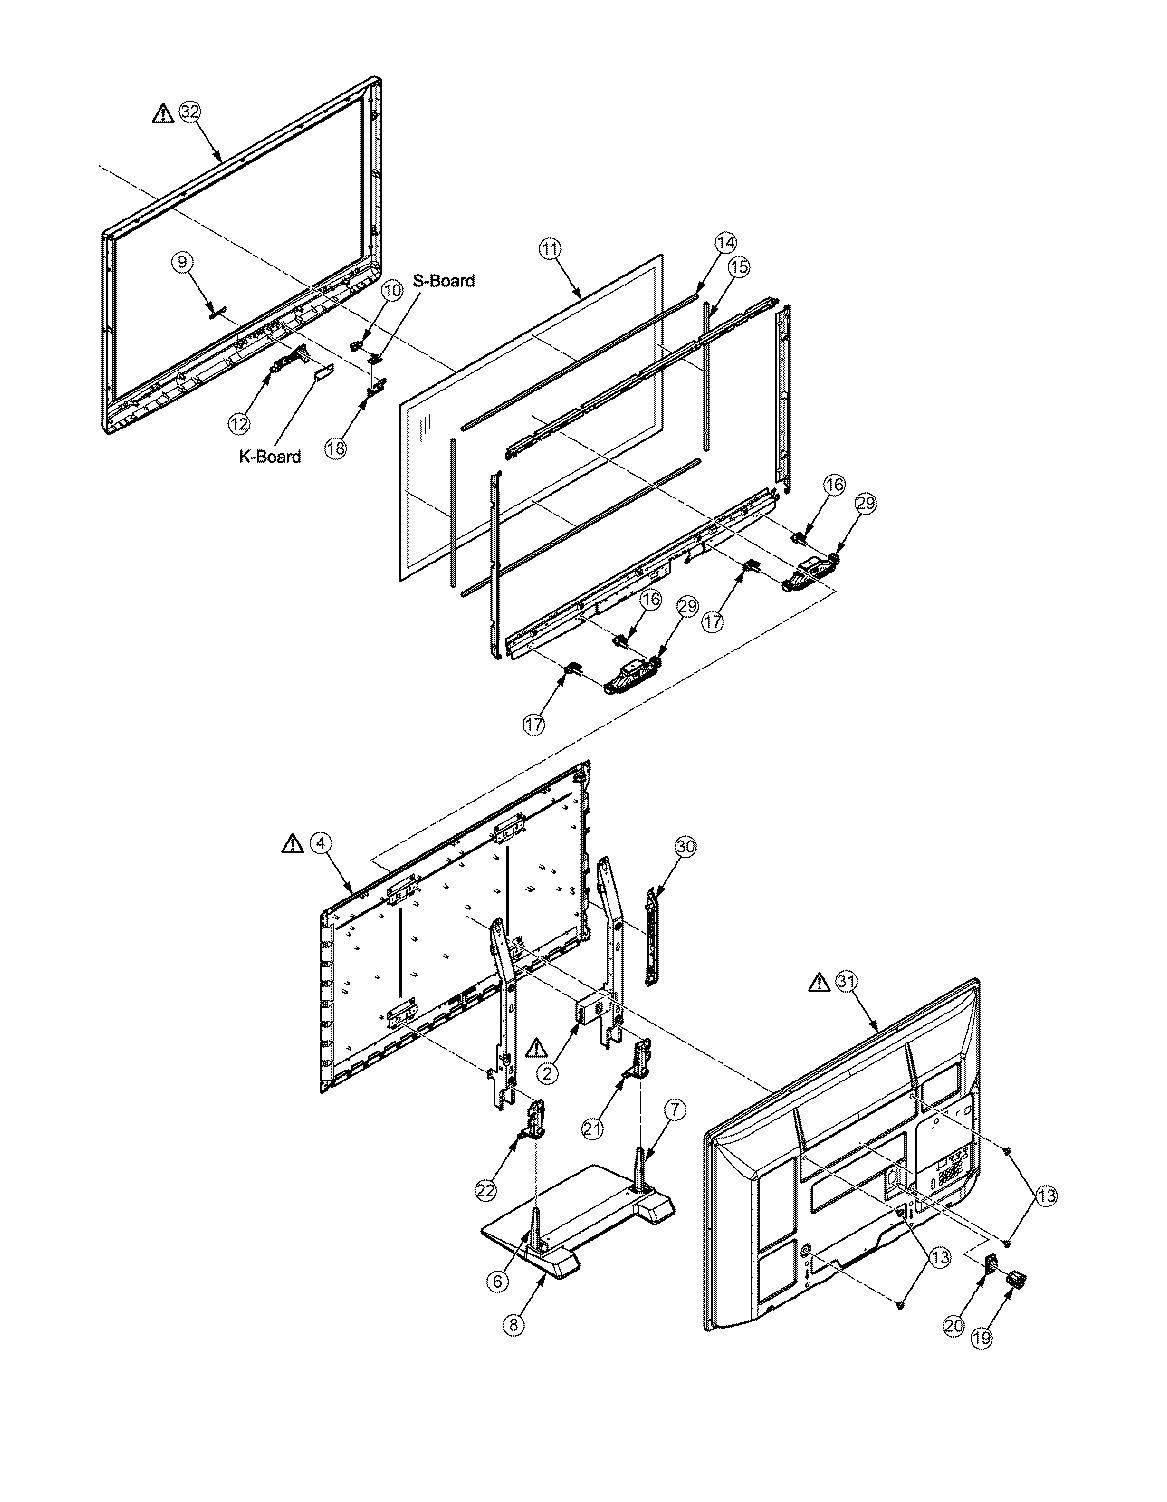 Panasonic model TC-P42U2 plasma television genuine parts